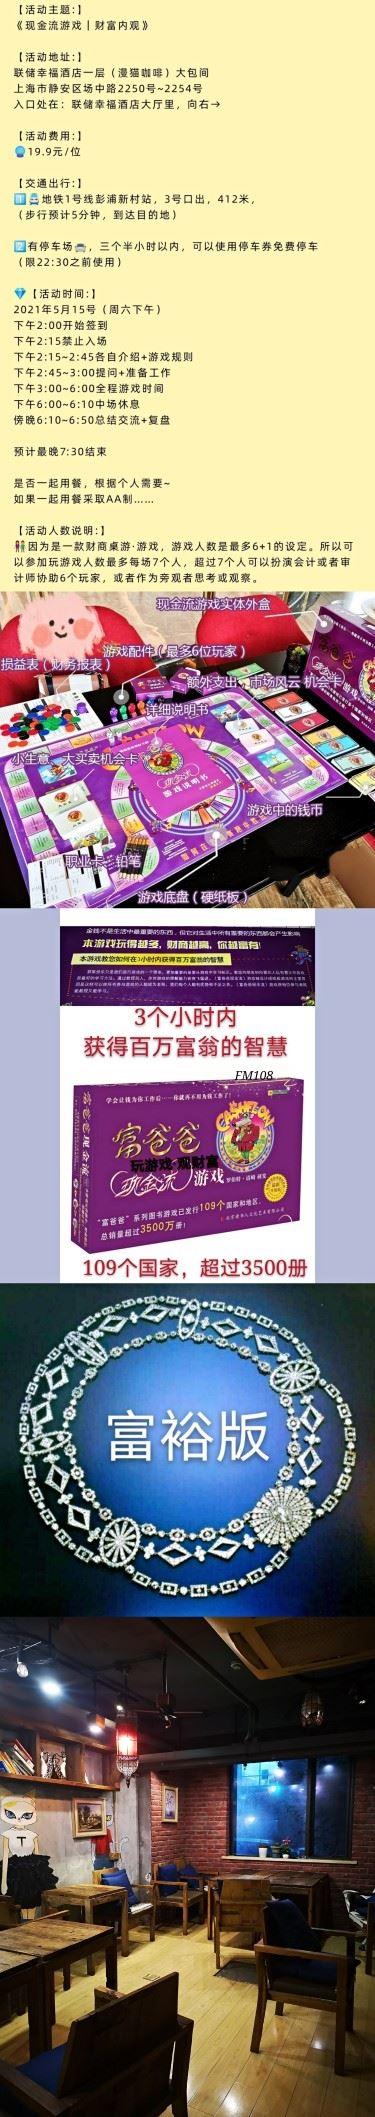 http://www.huodongxing.com/file/20191107/1653597577874/744117755605666.jpg